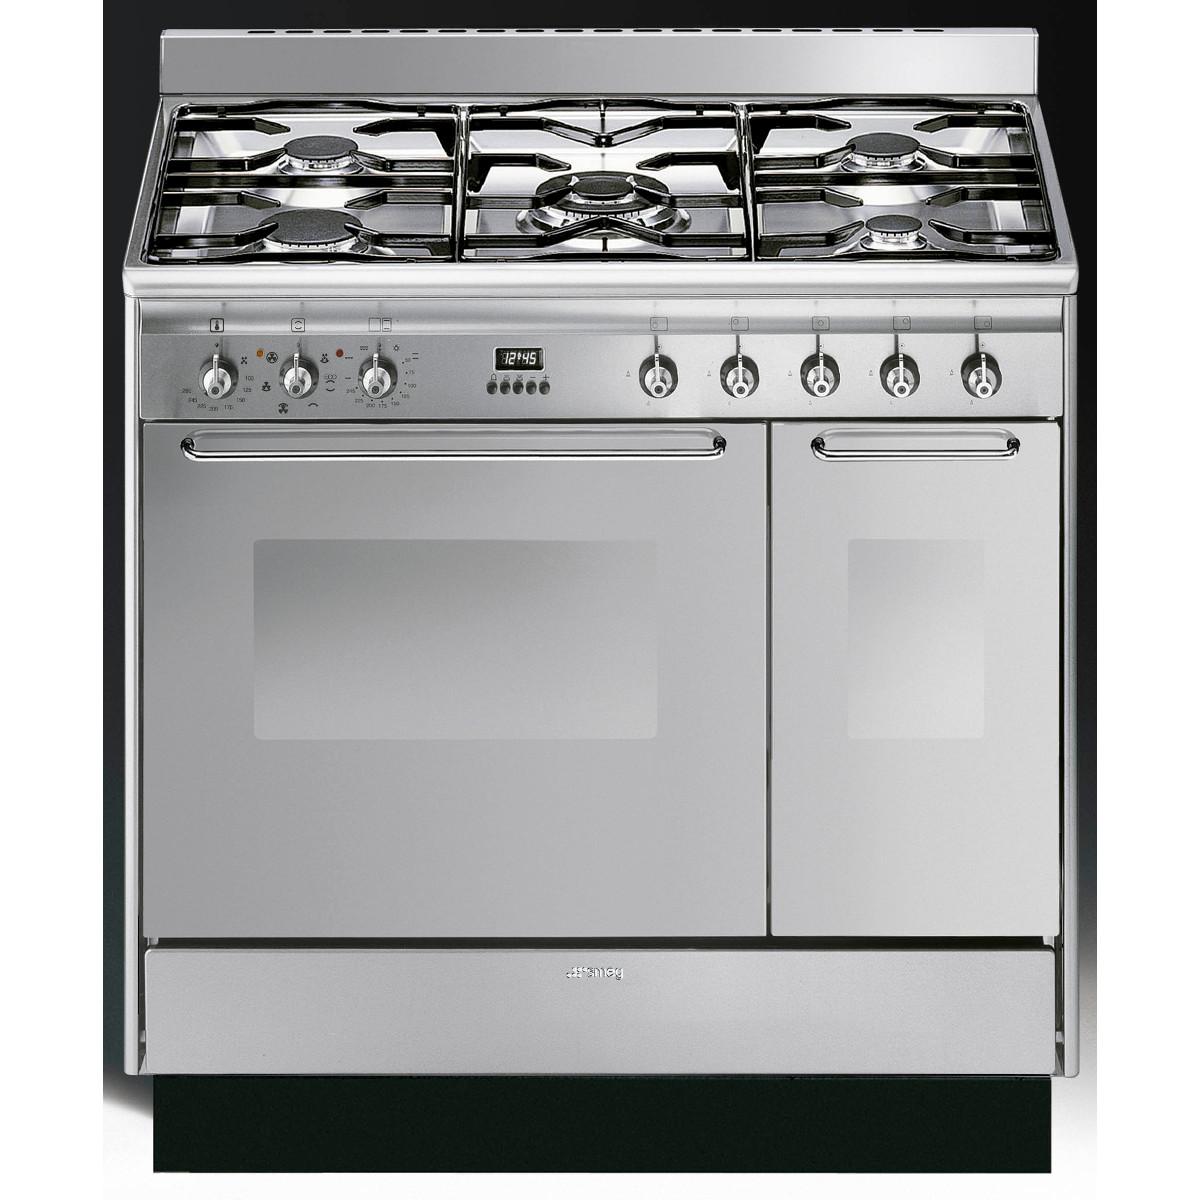 Smeg Cc92mx9 Cucina 90cm Dual Fuel Range Cooker  Discount